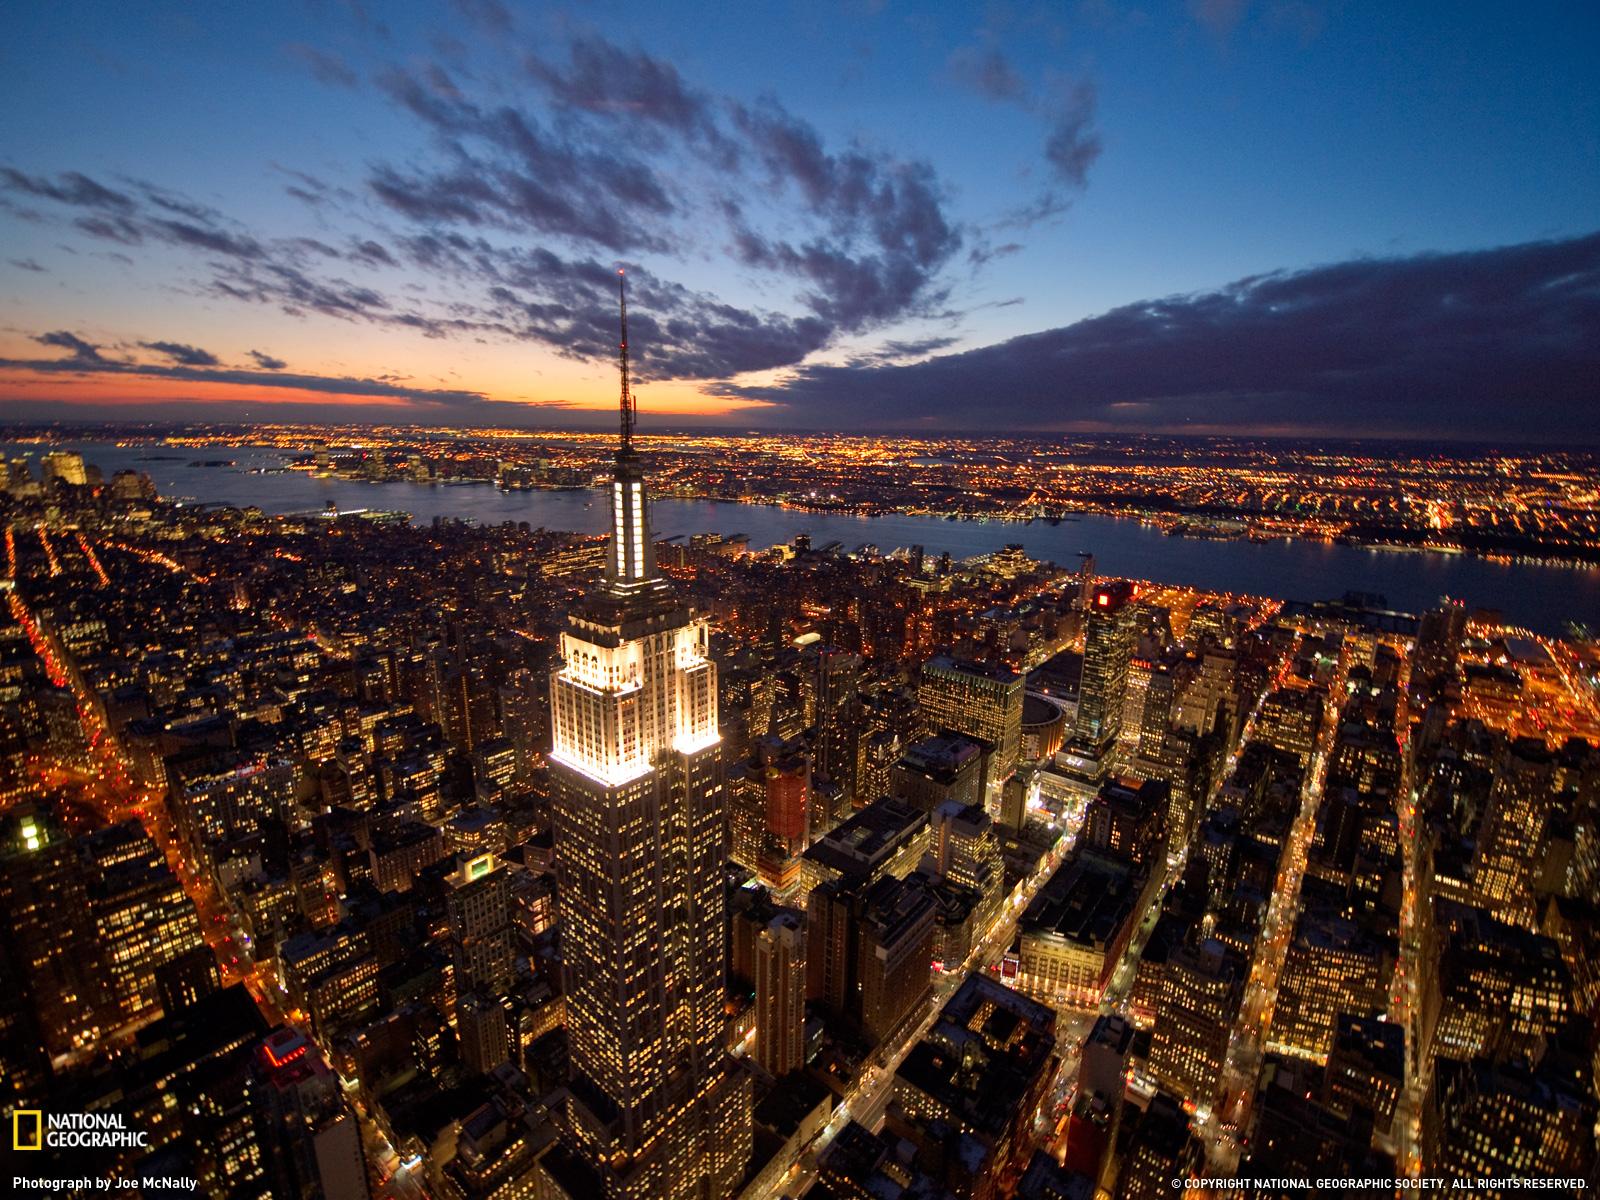 New Wallpaper 2012 New York Wallpapers 1600x1200